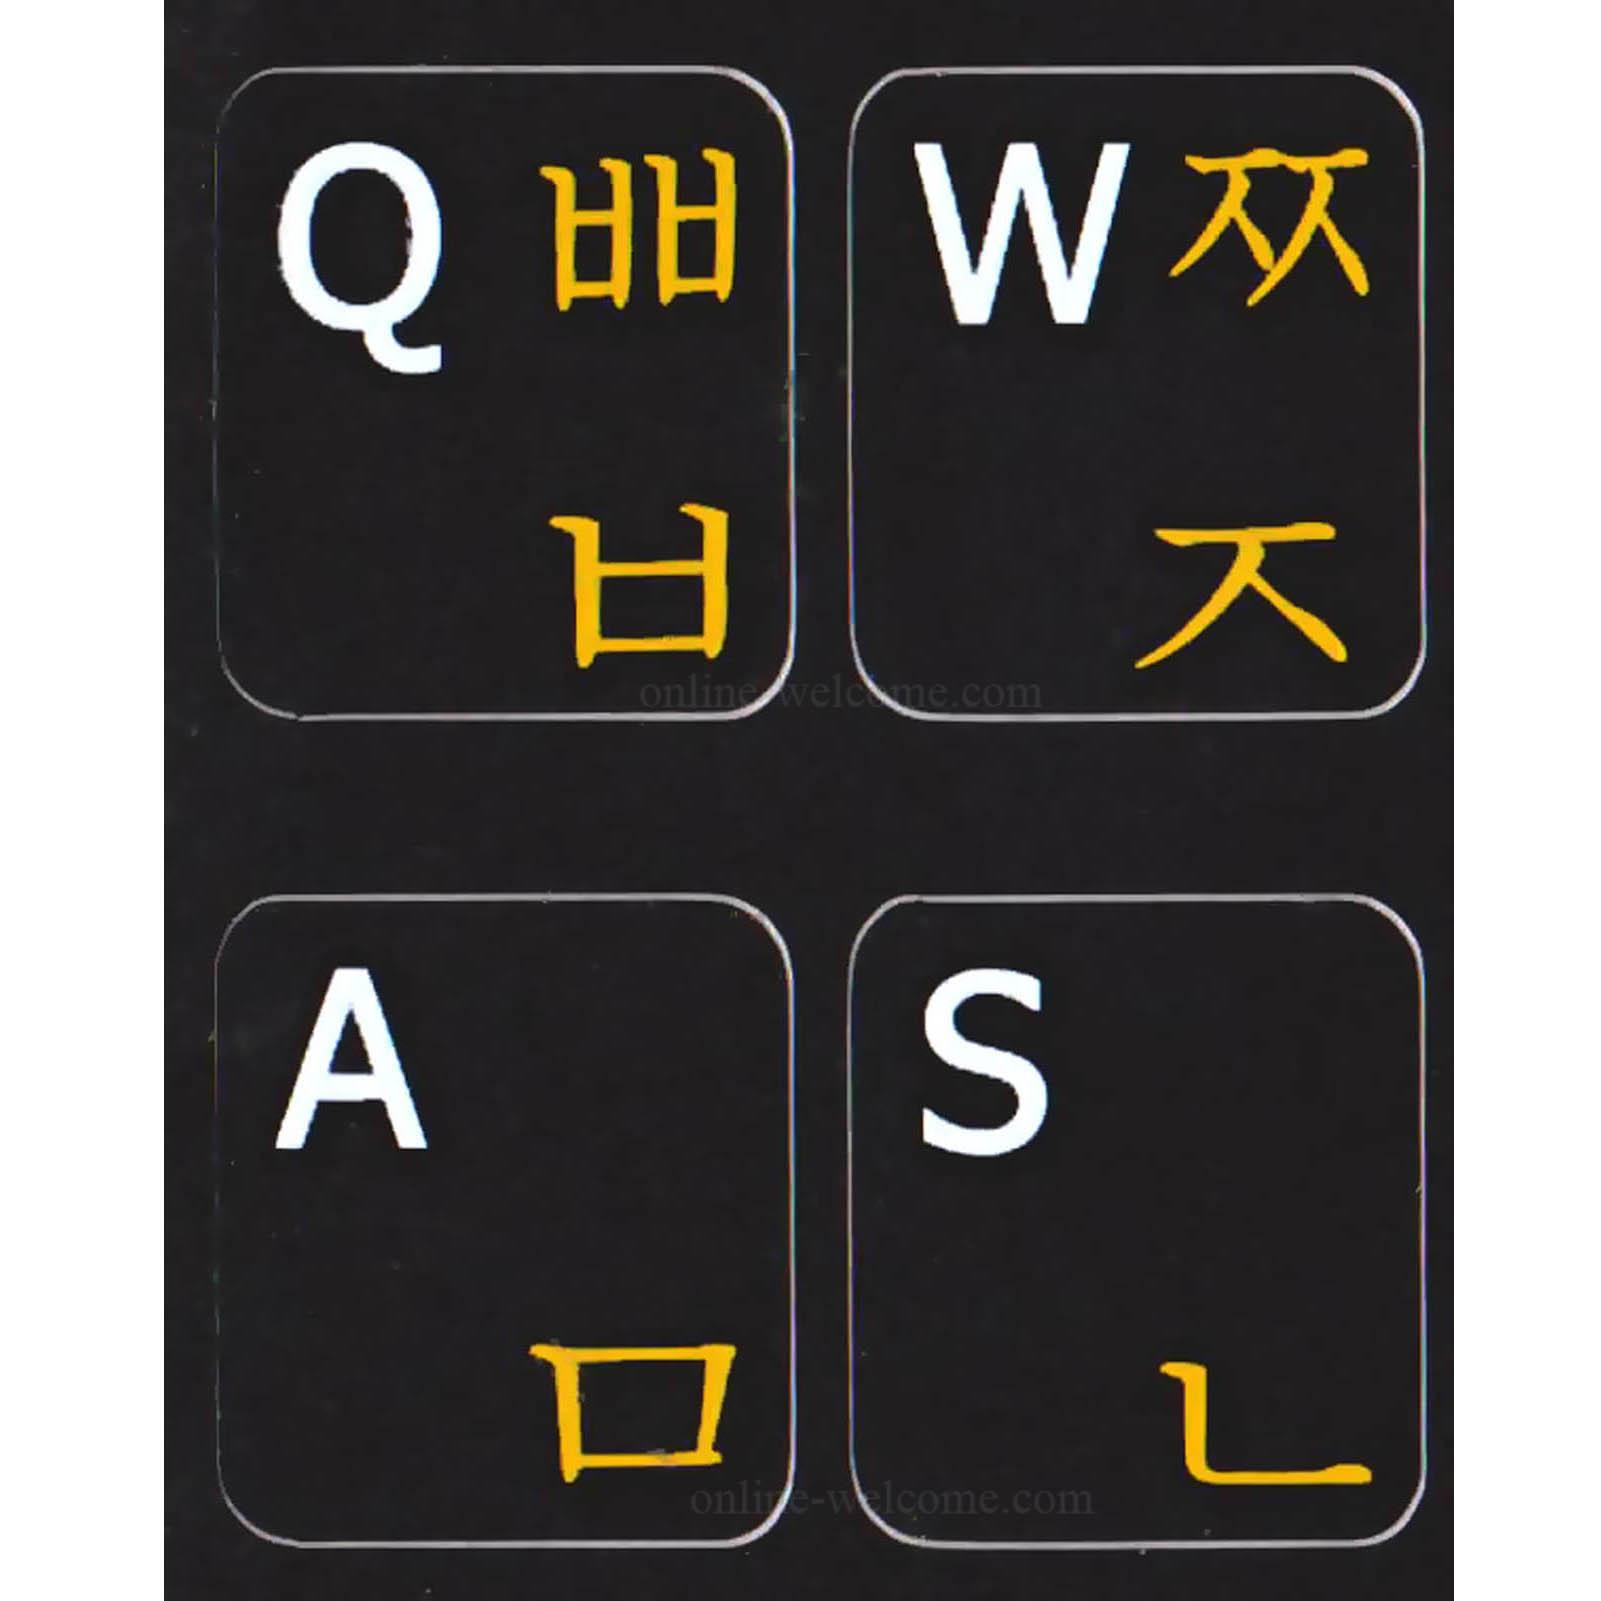 Korean-English keyboard letters black background non transparent labels stivkers